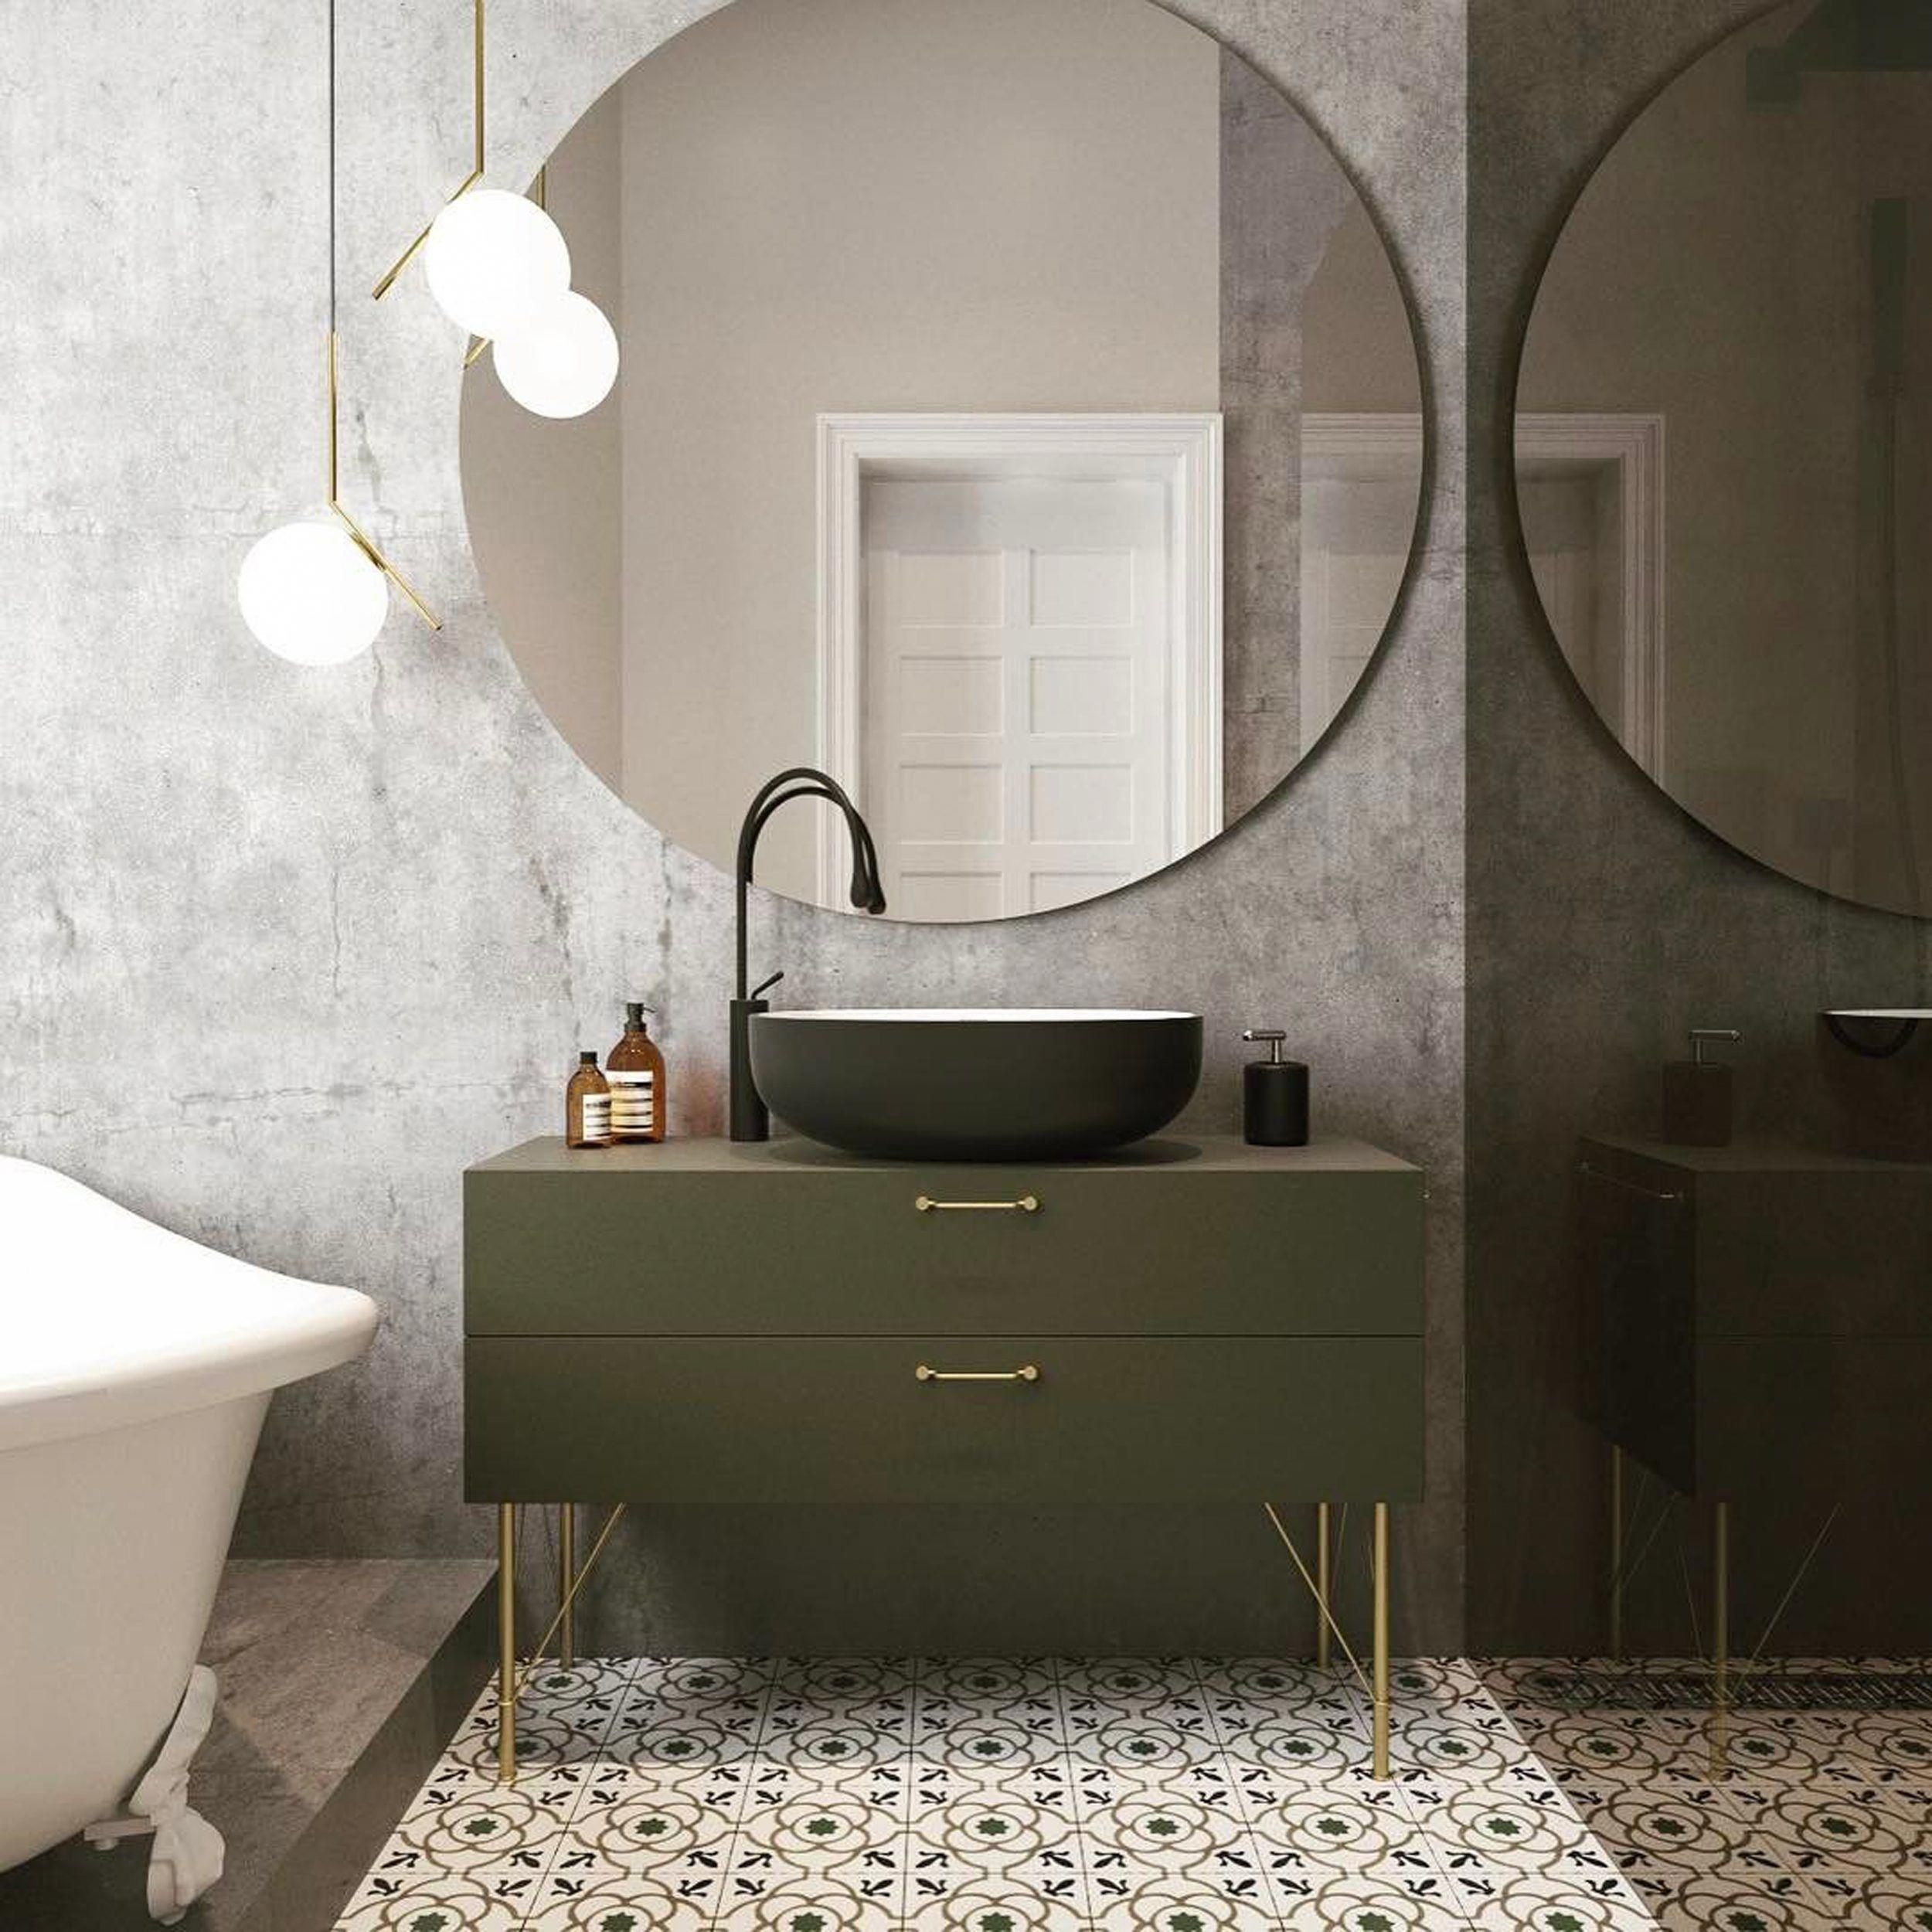 Modern Bathroom Design Trends 2018 Home Style Modernbathrooms Bathroomdesign2018tre Bathroom Inspiration Modern Modern Bathroom Design Bathroom Inspiration